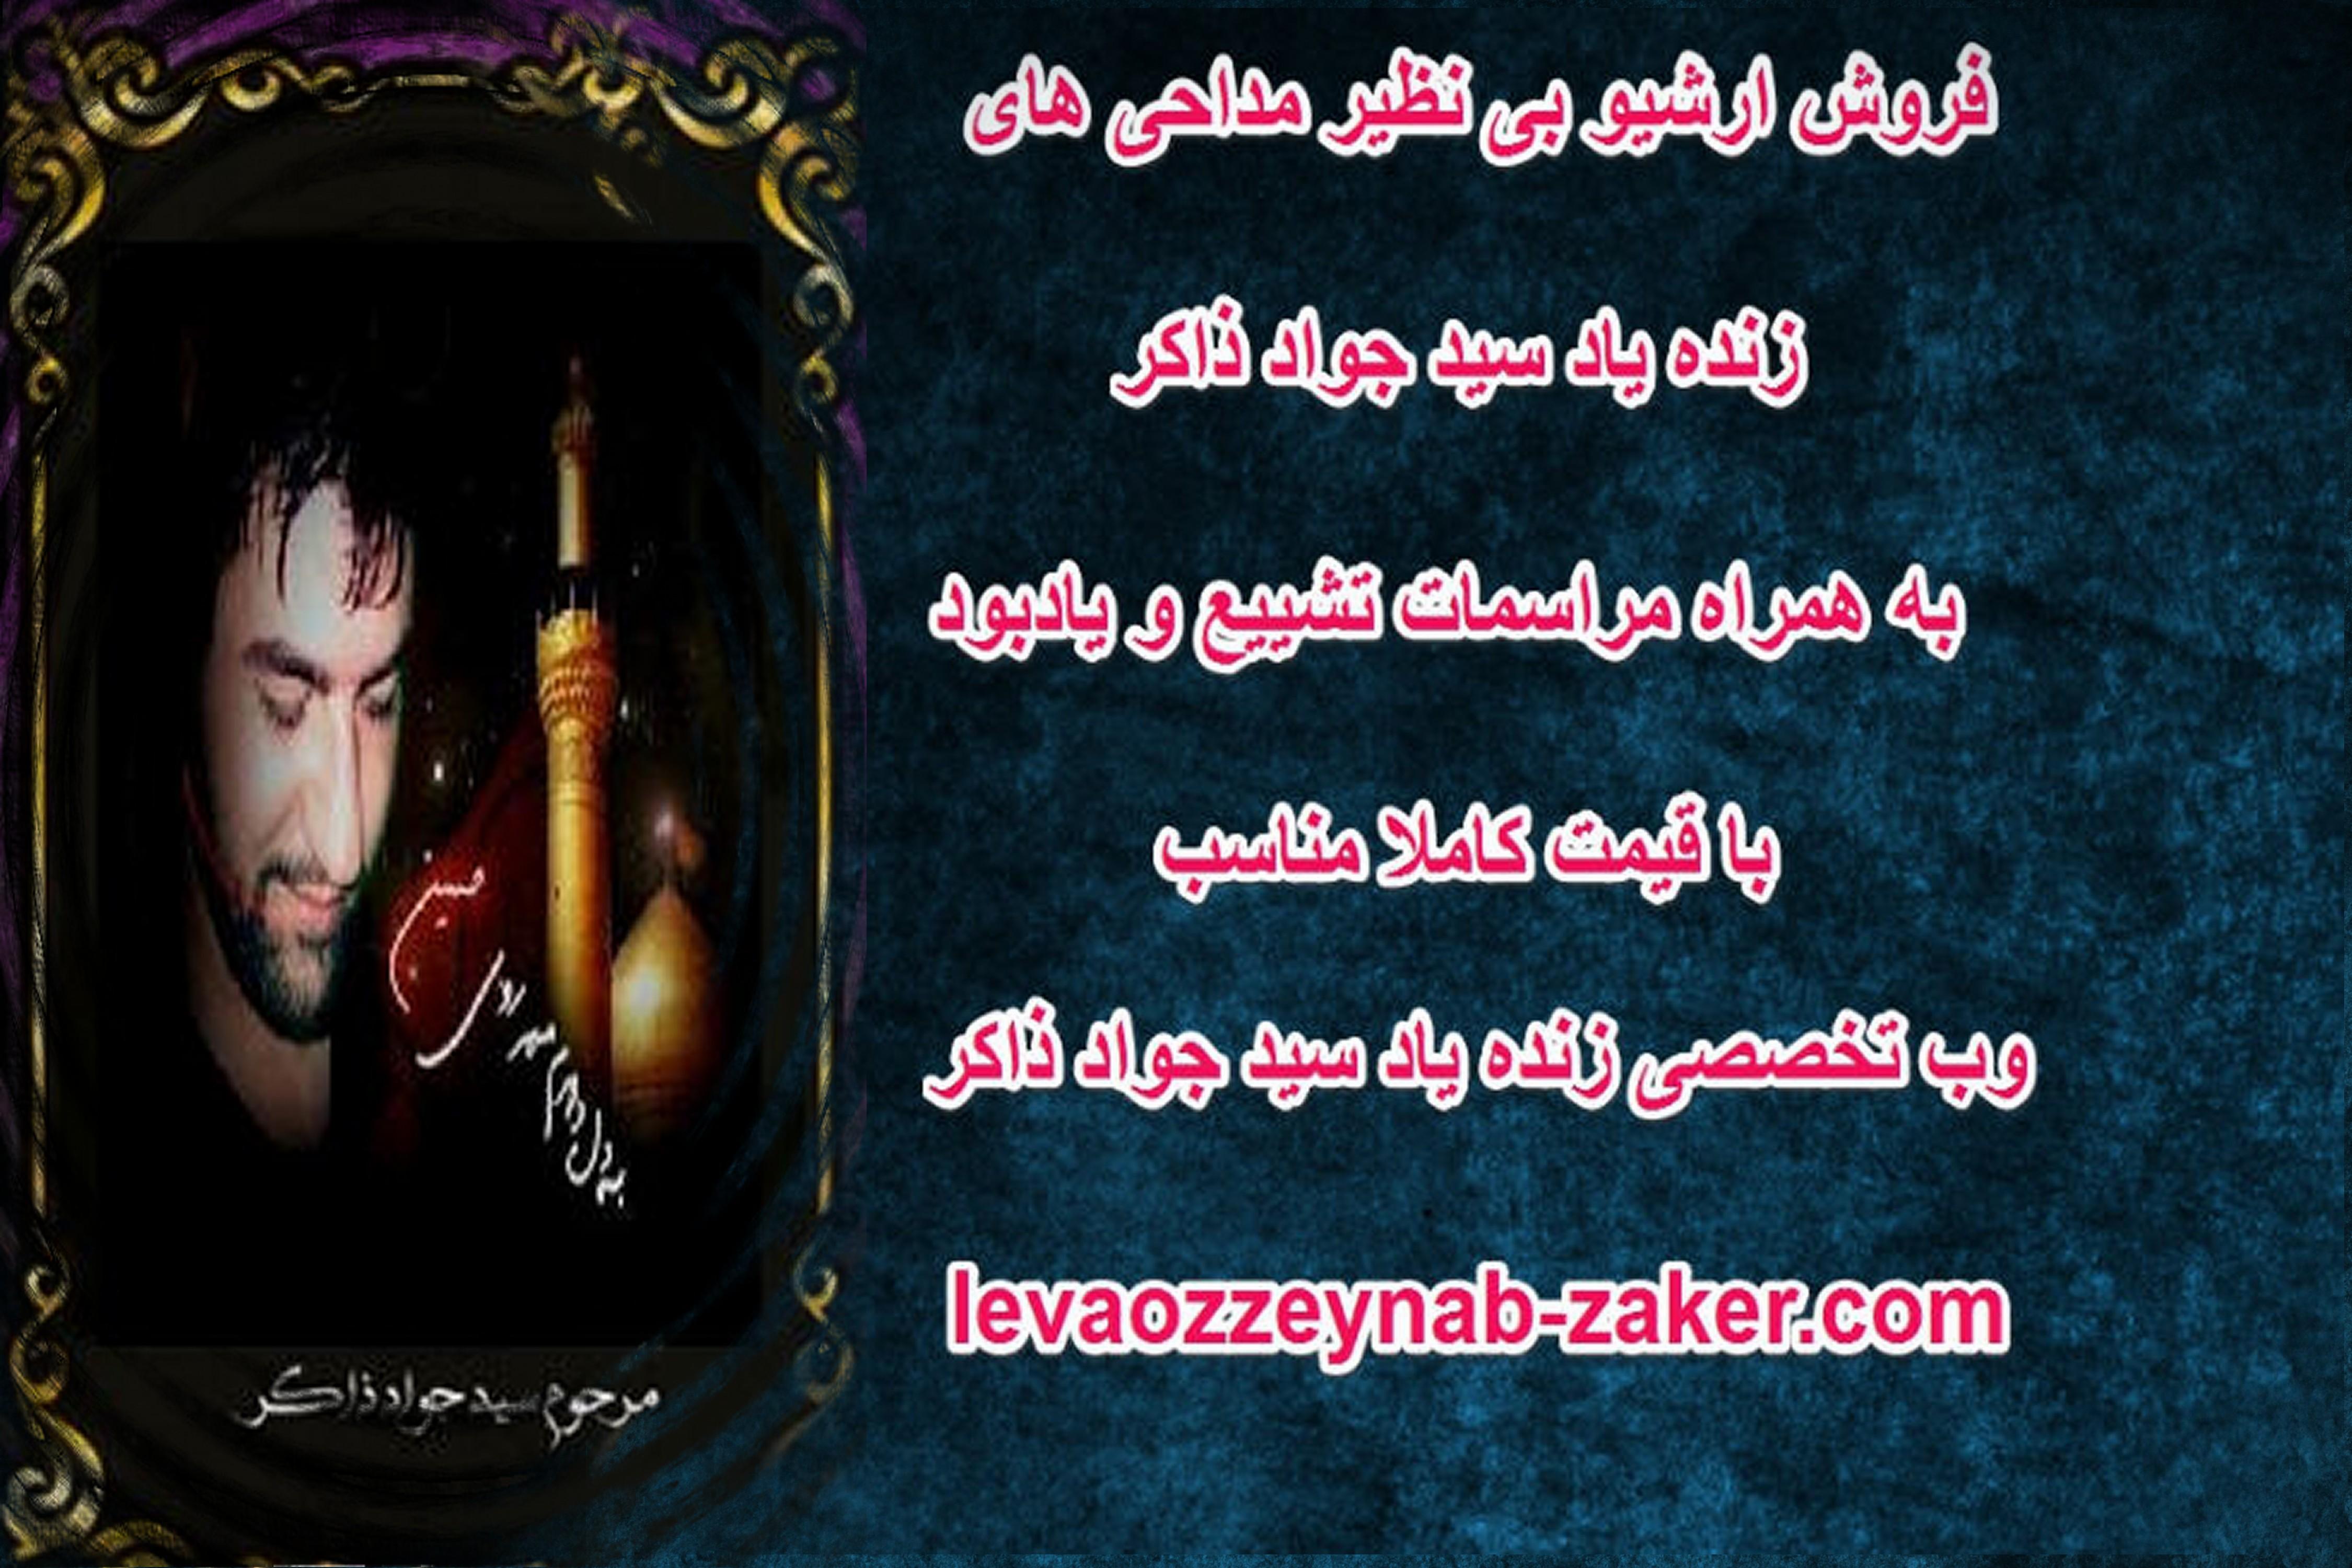 http://s6.picofile.com/file/8252670518/zaker_fo.jpg